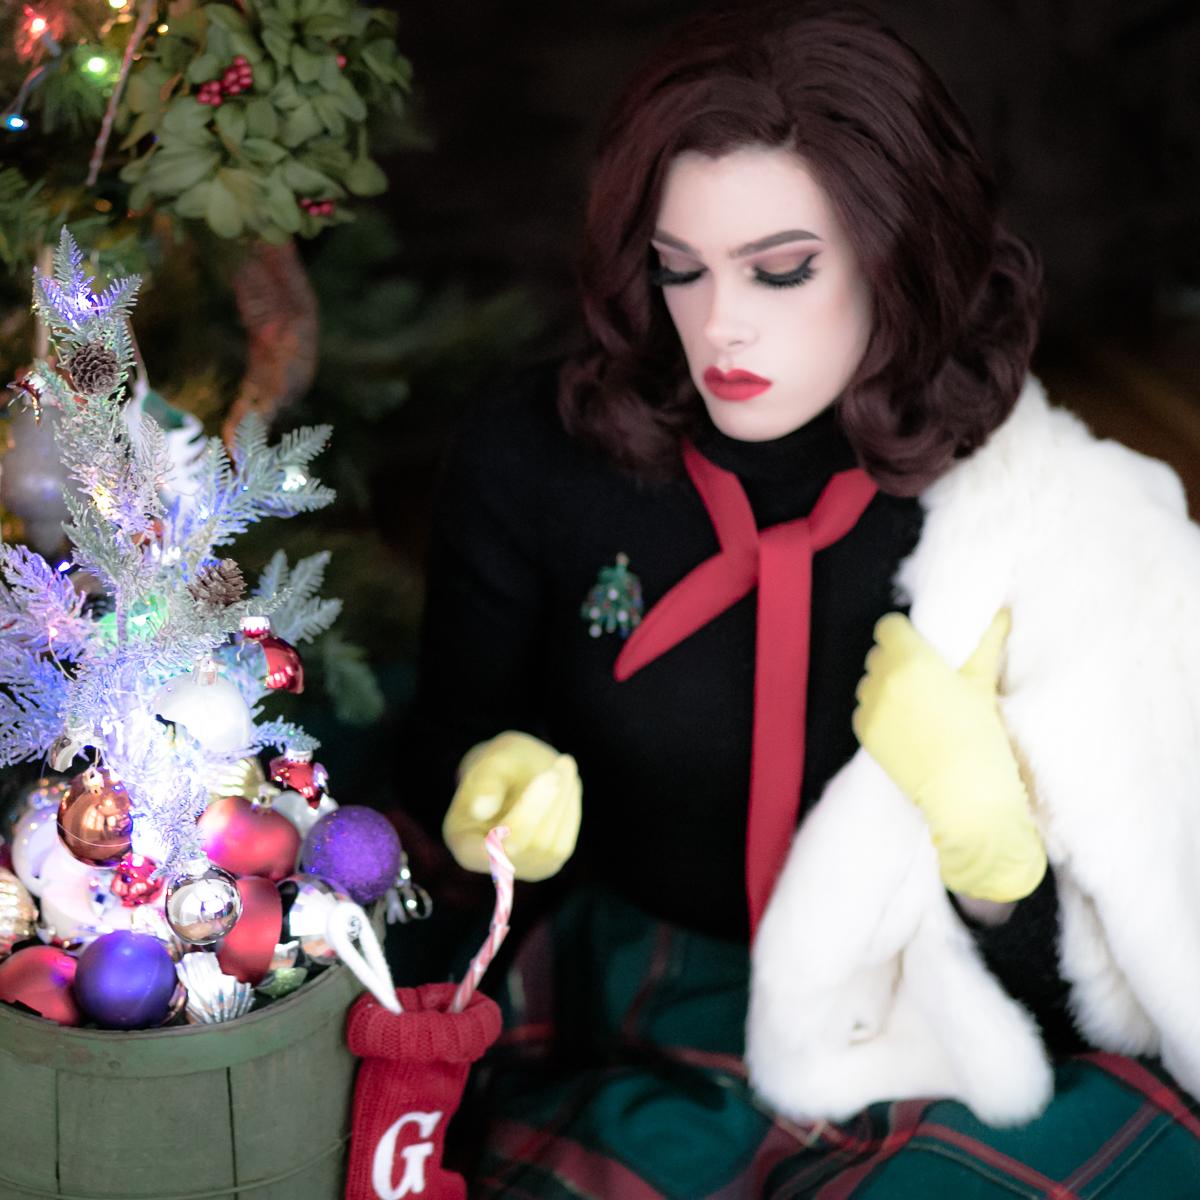 Yellow Gloves_Happy Holidays?.jpg